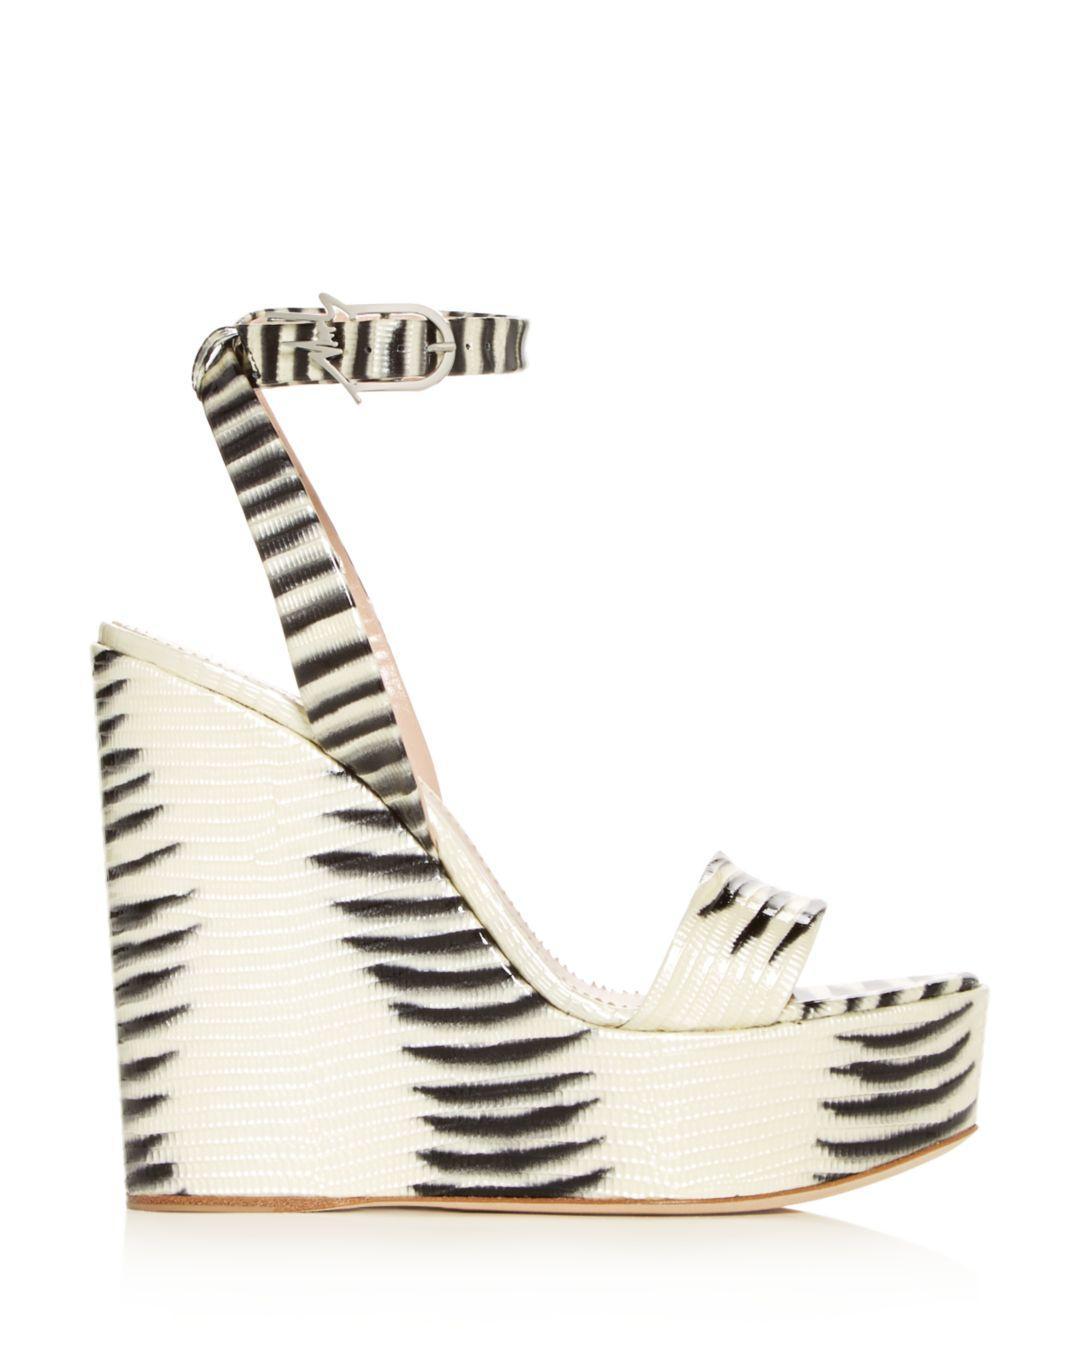 Platform Sandals Gypsy Zanotti Giuseppe Lyst Women's Wedge OkwPuiZXTl